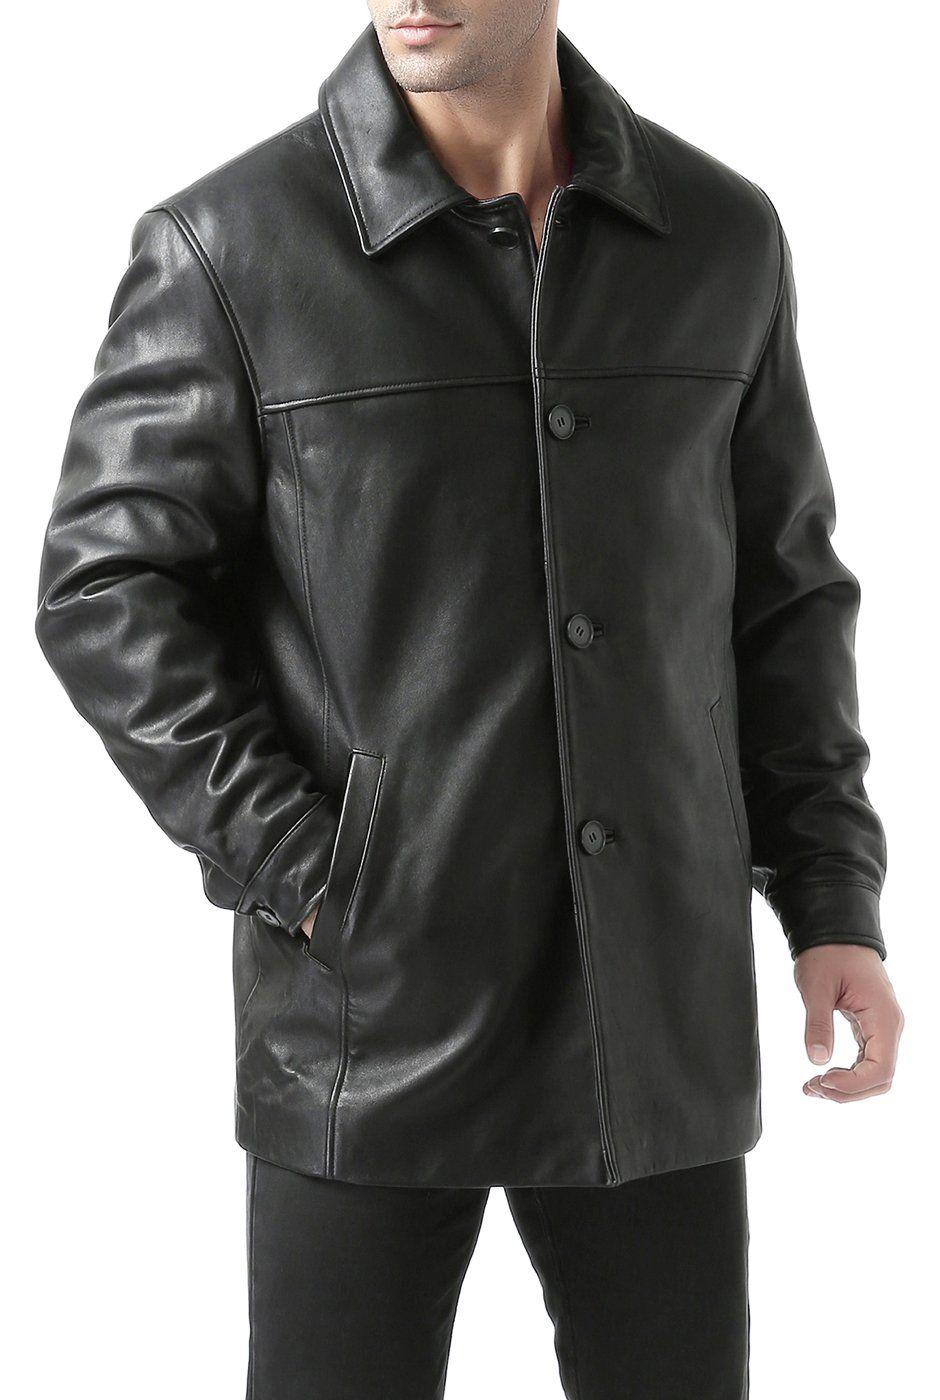 Bgsd Men S Samuel New Zealand Lambskin Leather Car Coat Regular And Big Tall Sizes Car Coat Leather Jacket Men Buy Leather Jacket [ 1400 x 940 Pixel ]